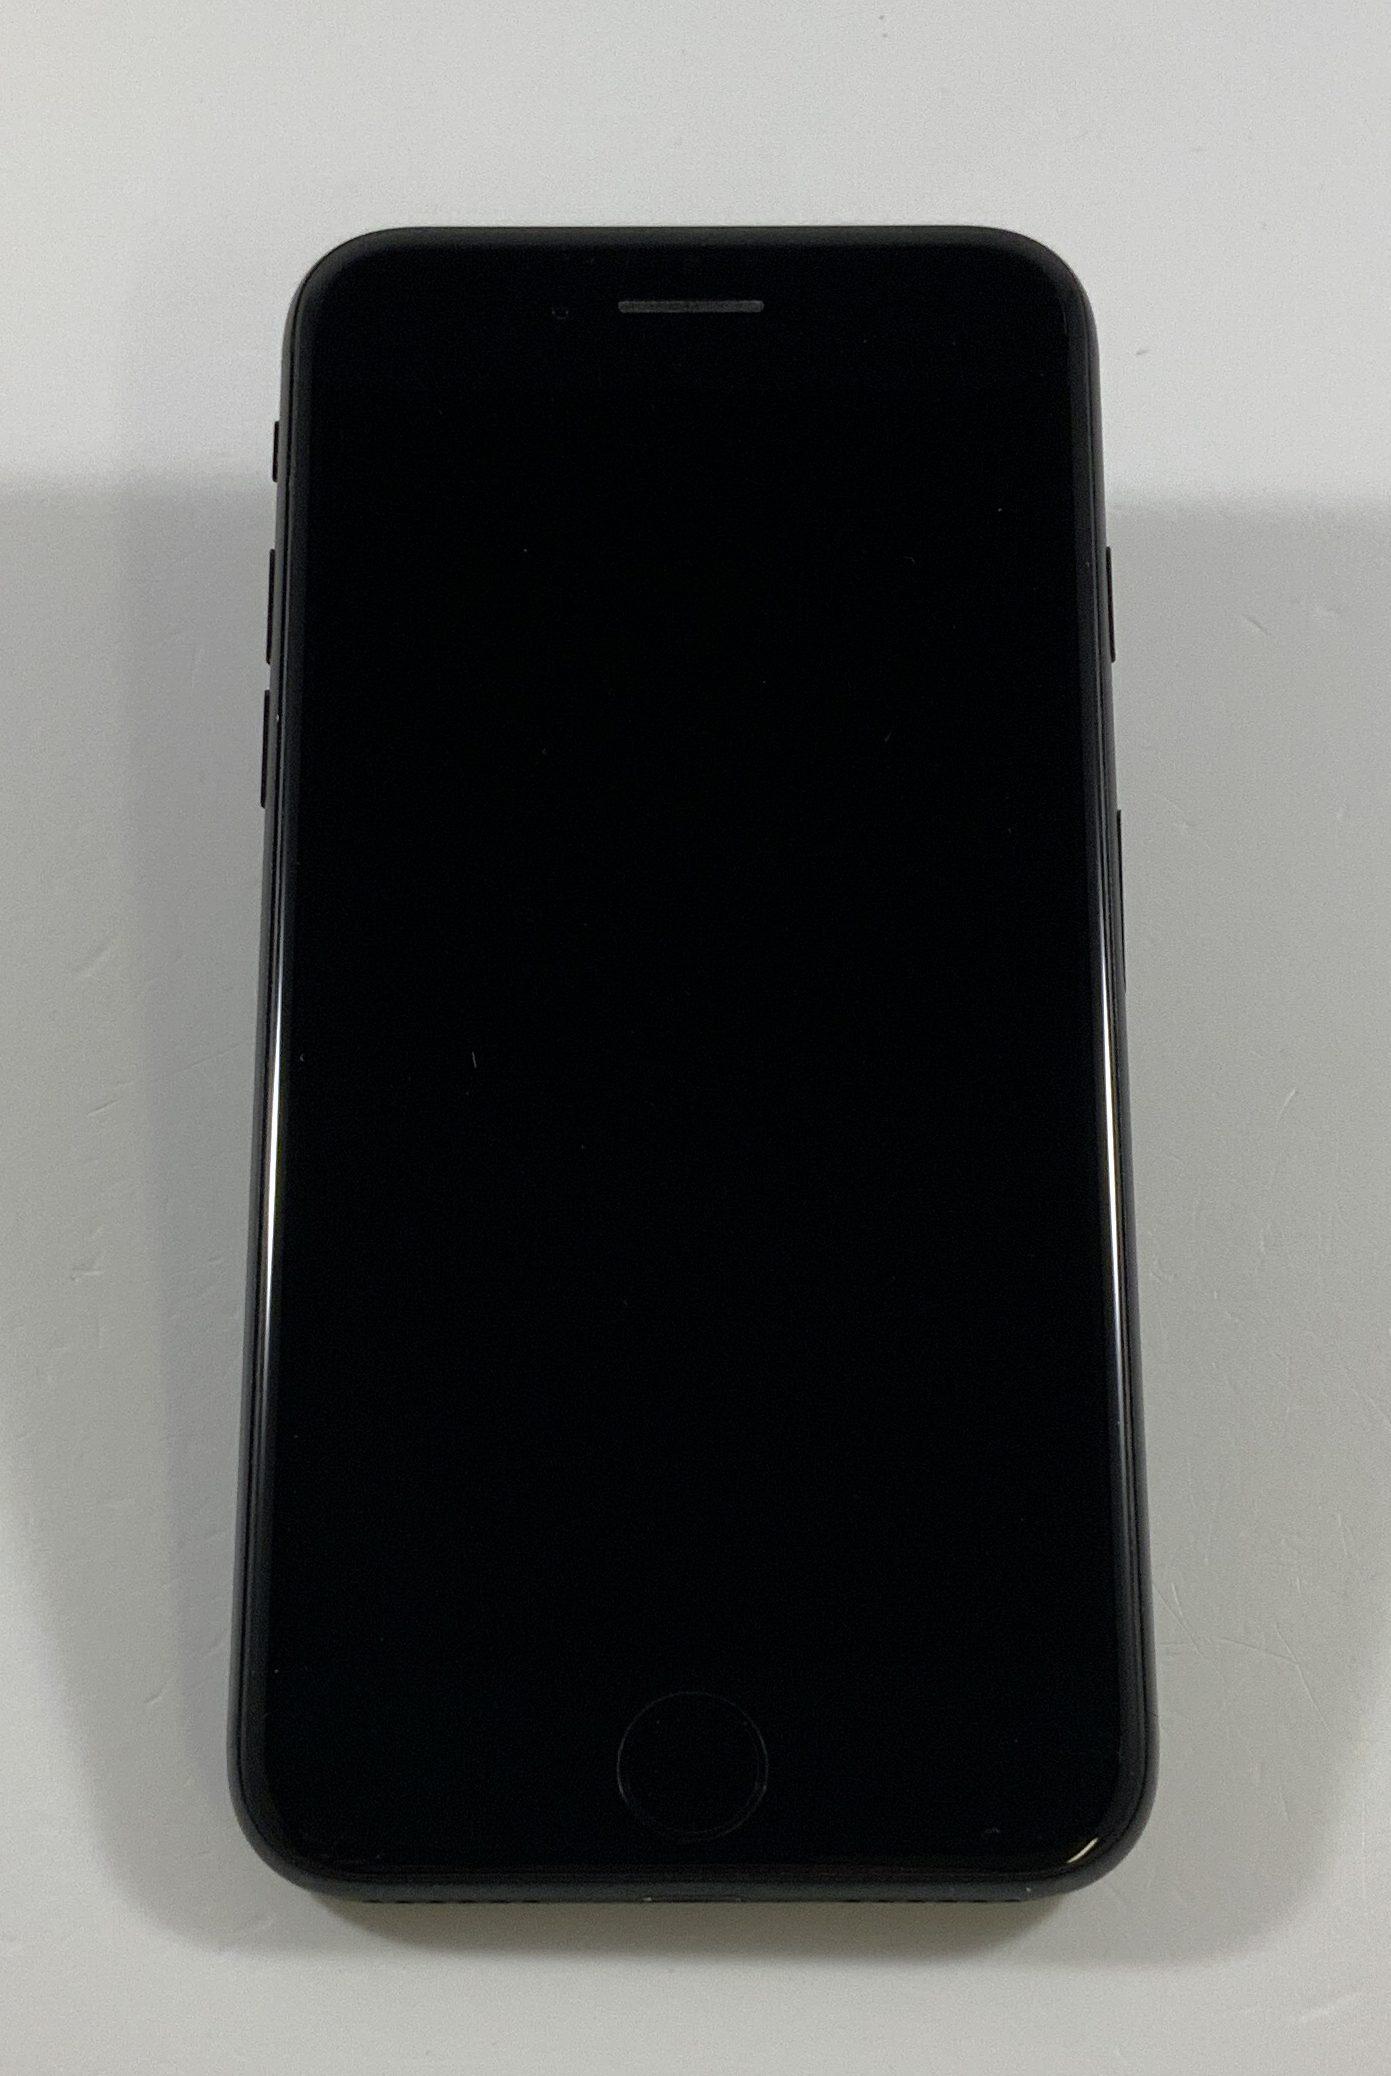 iPhone 7 128GB, 128GB, Black, Afbeelding 1